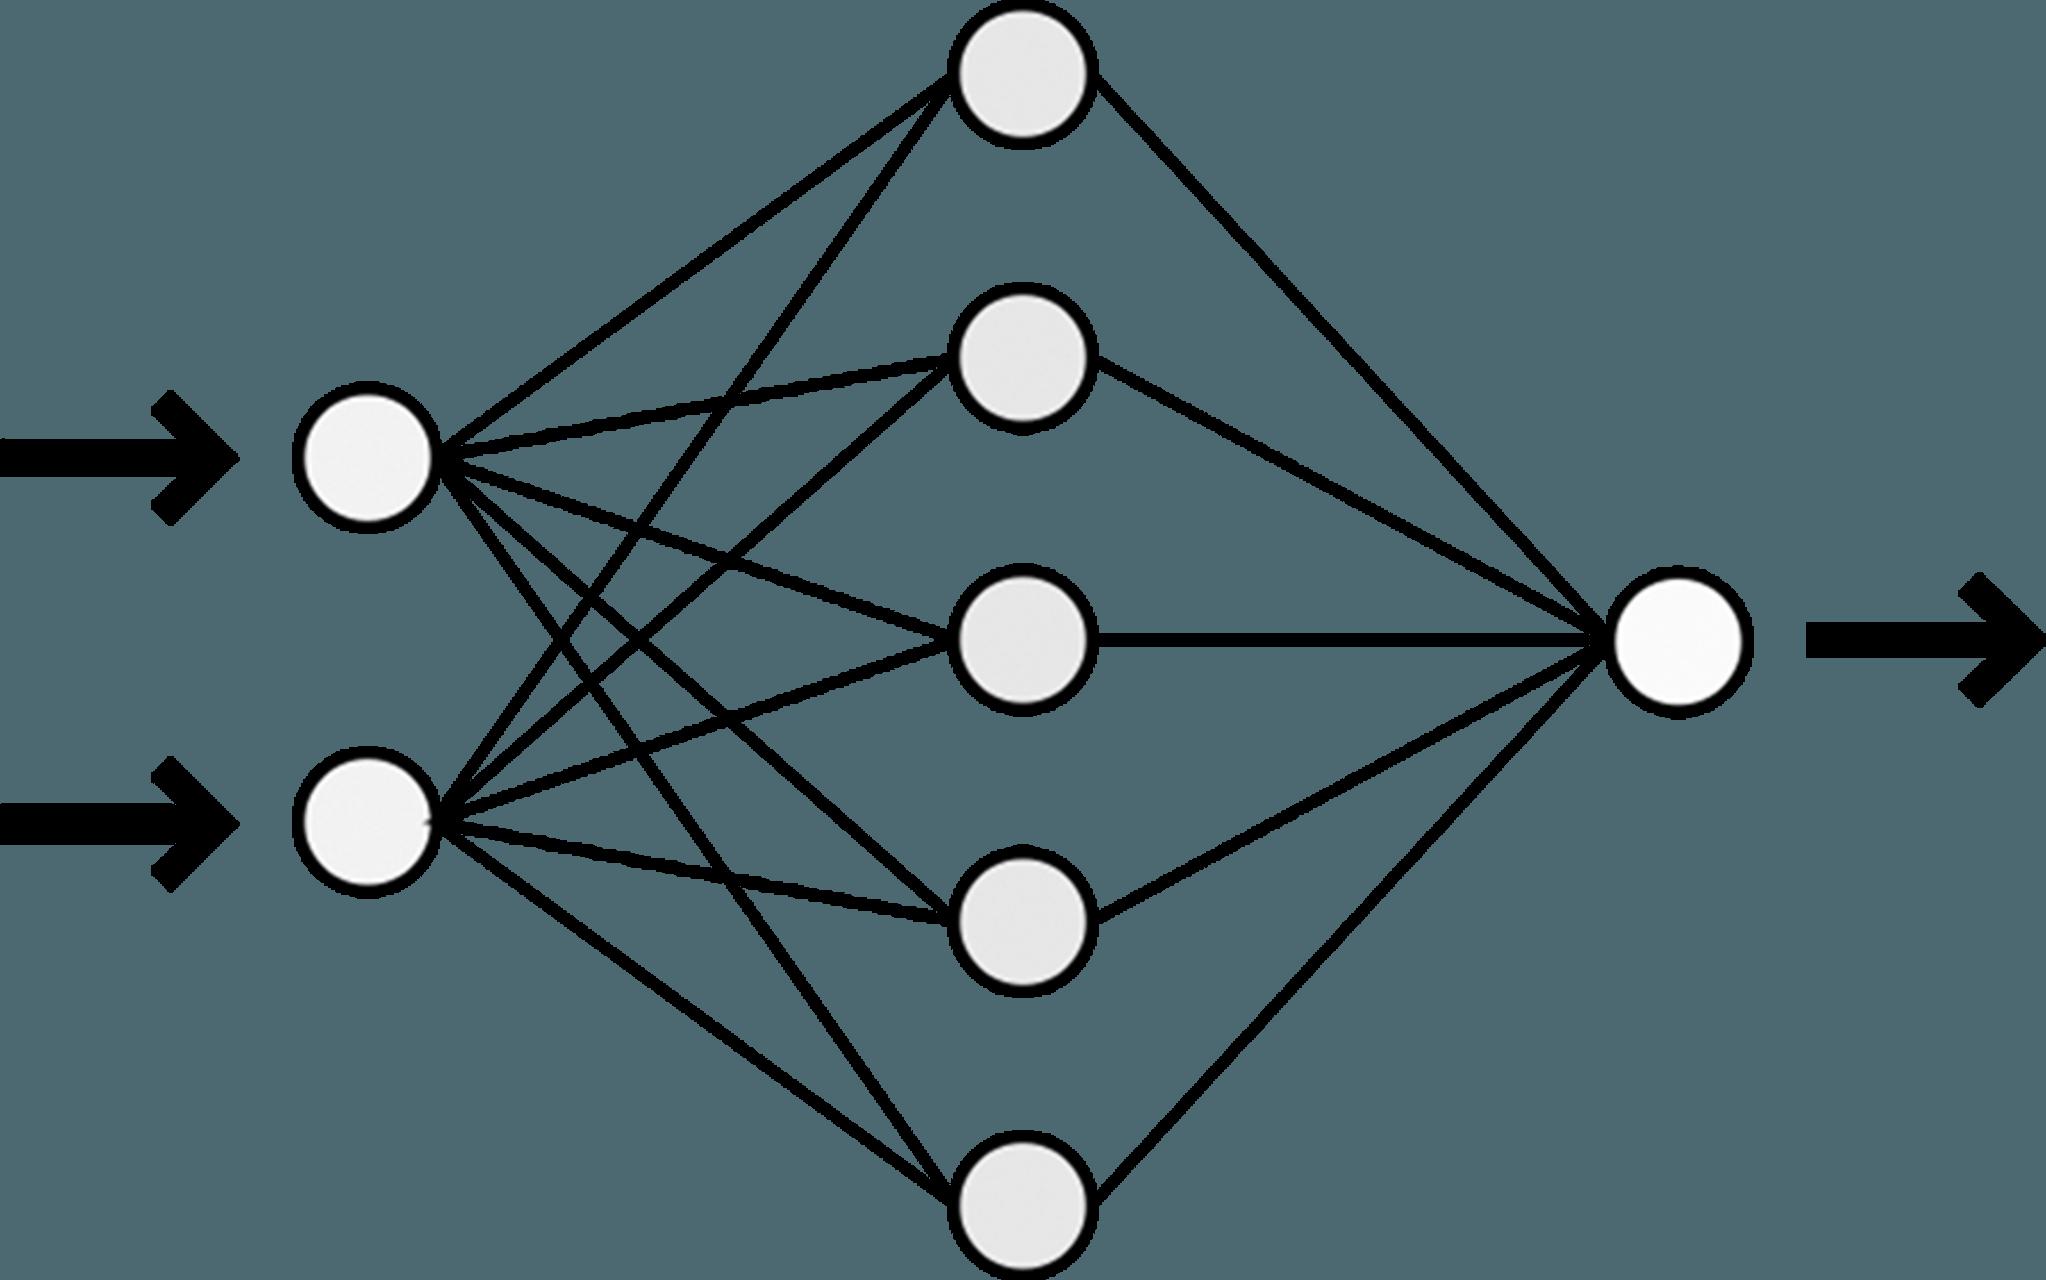 Deep Learning Neuronale Netze Und Mehr